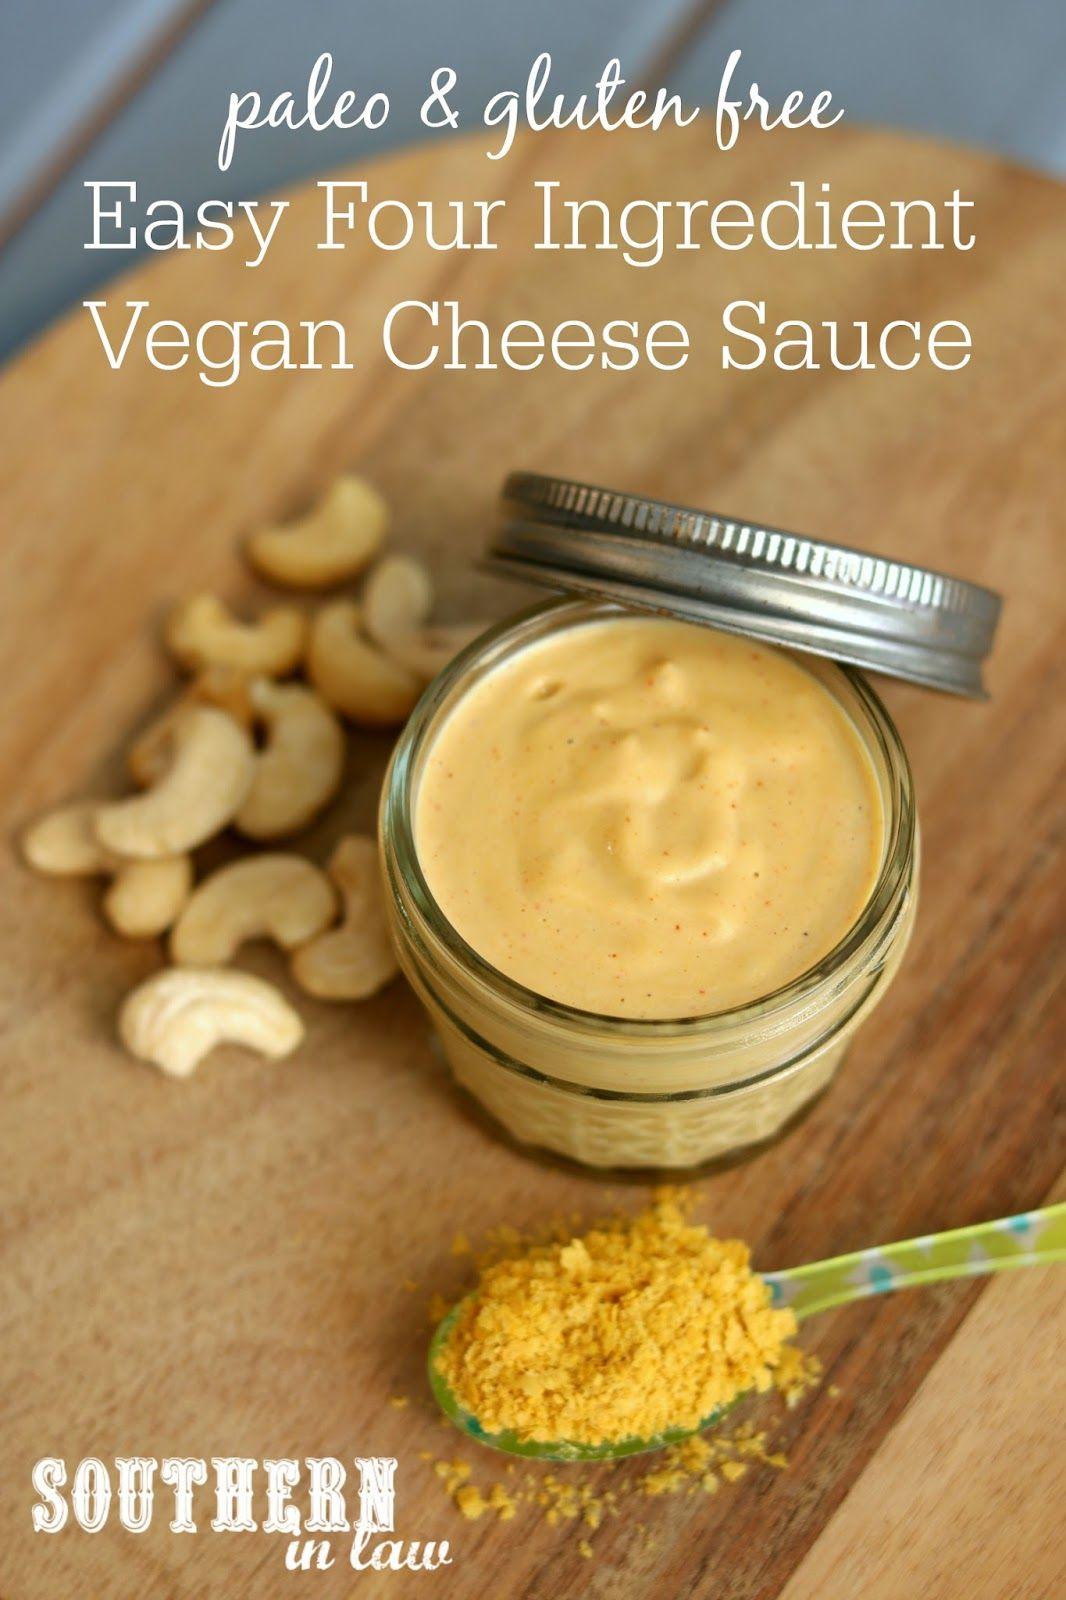 Easy Four Ingredient Vegan Cheese Sauce Recipe in 2020